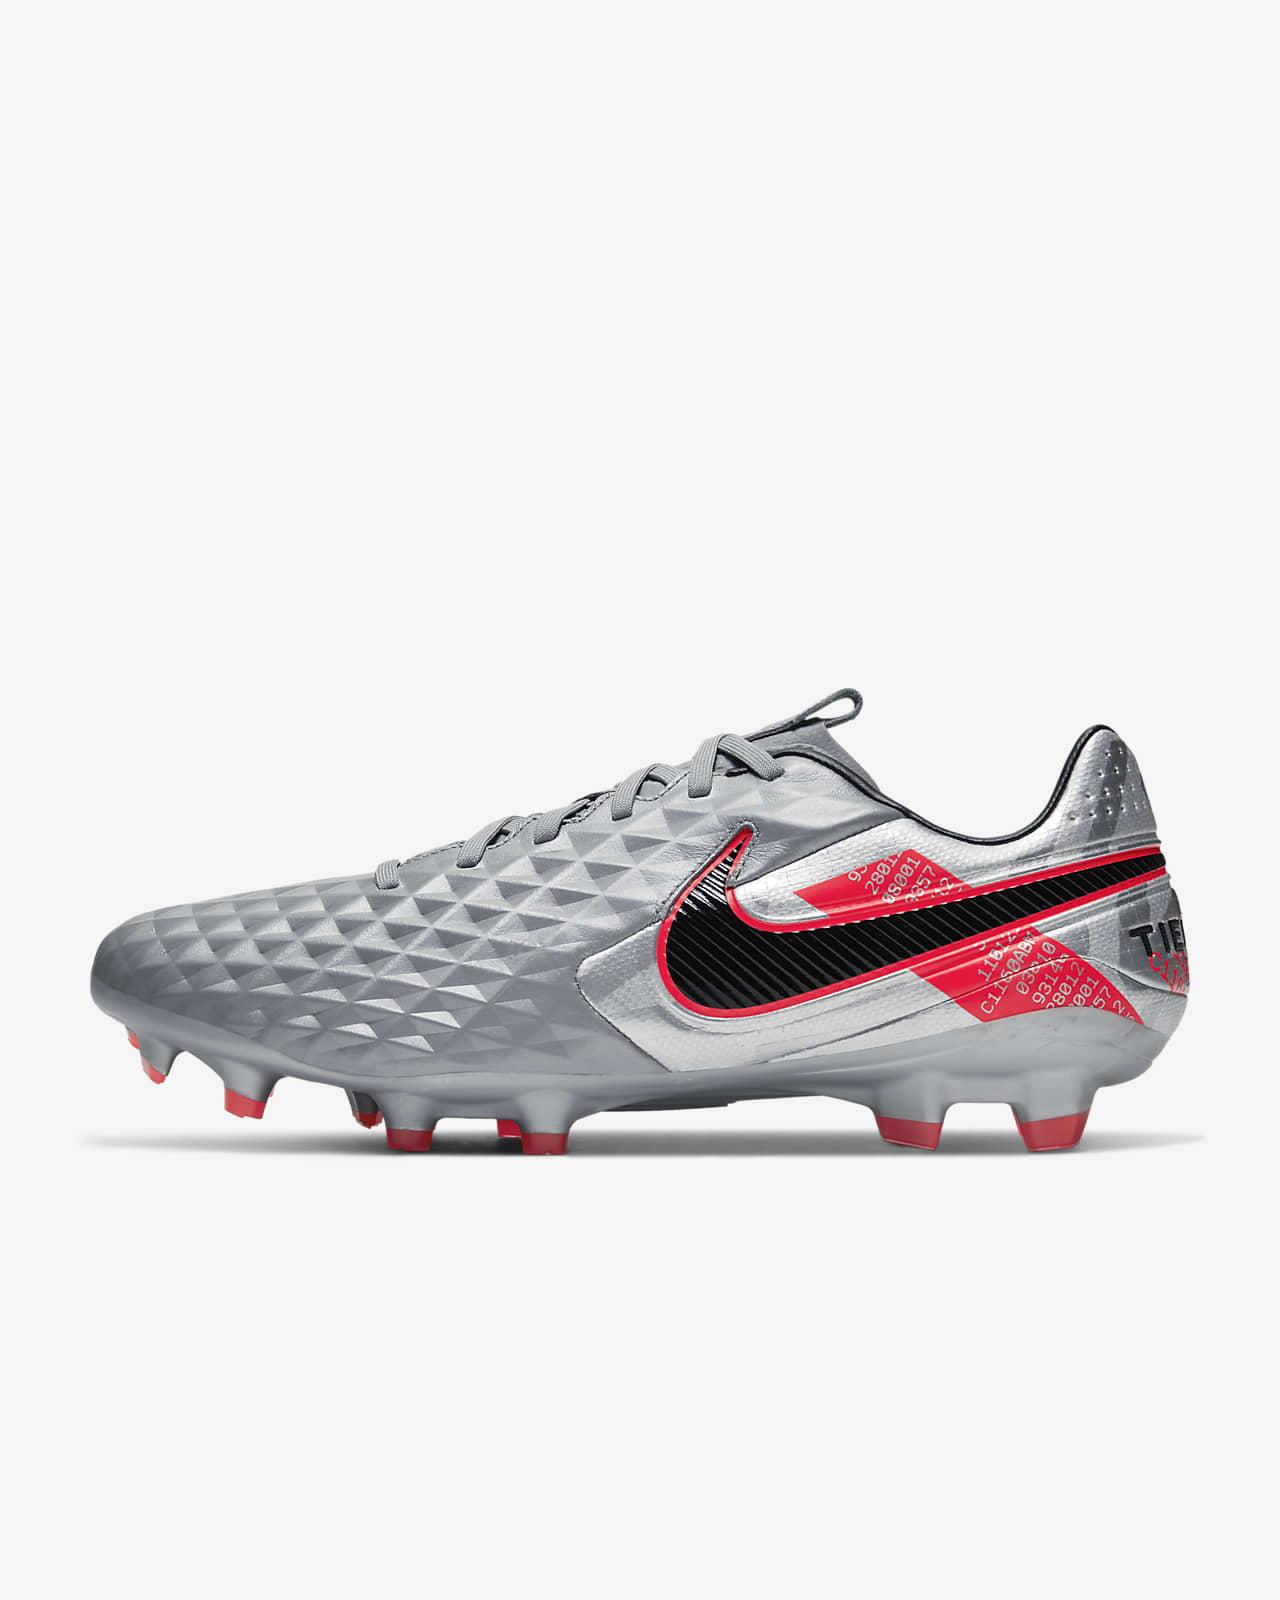 Nike Tiempo Legend 8 Pro FG Botes de futbol per a terreny ferm